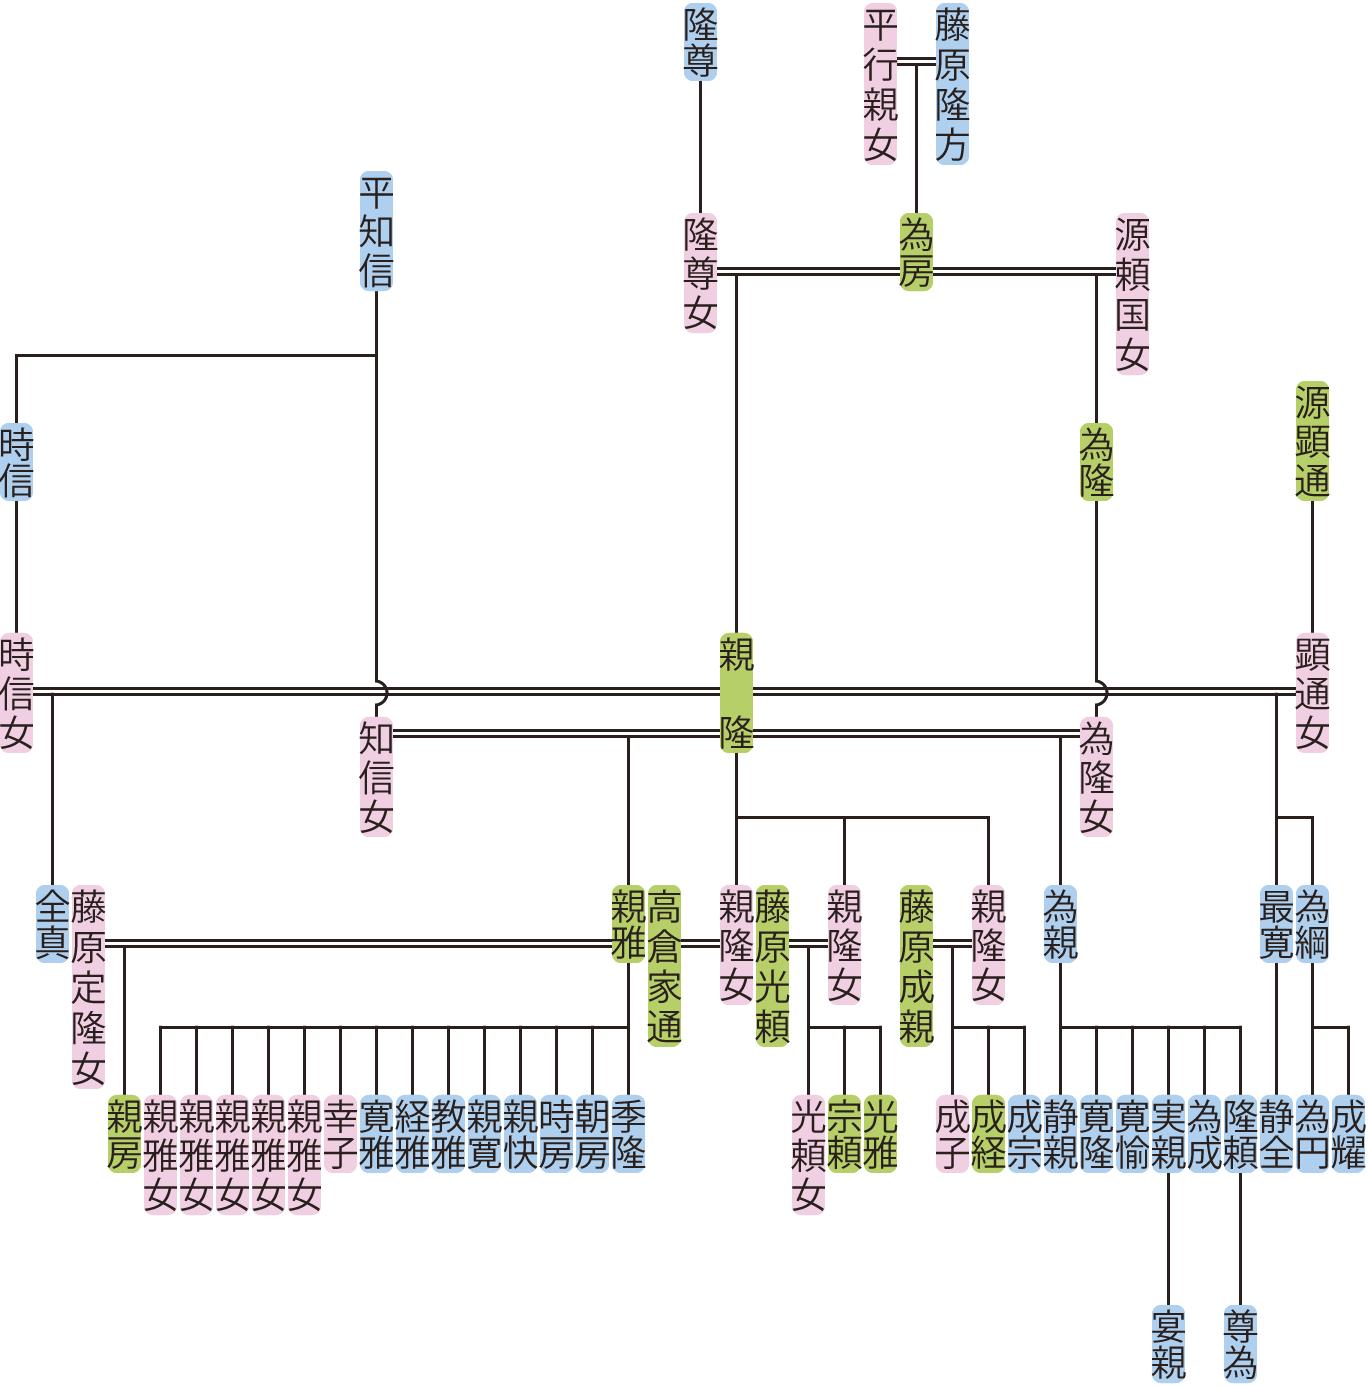 藤原親隆の系図